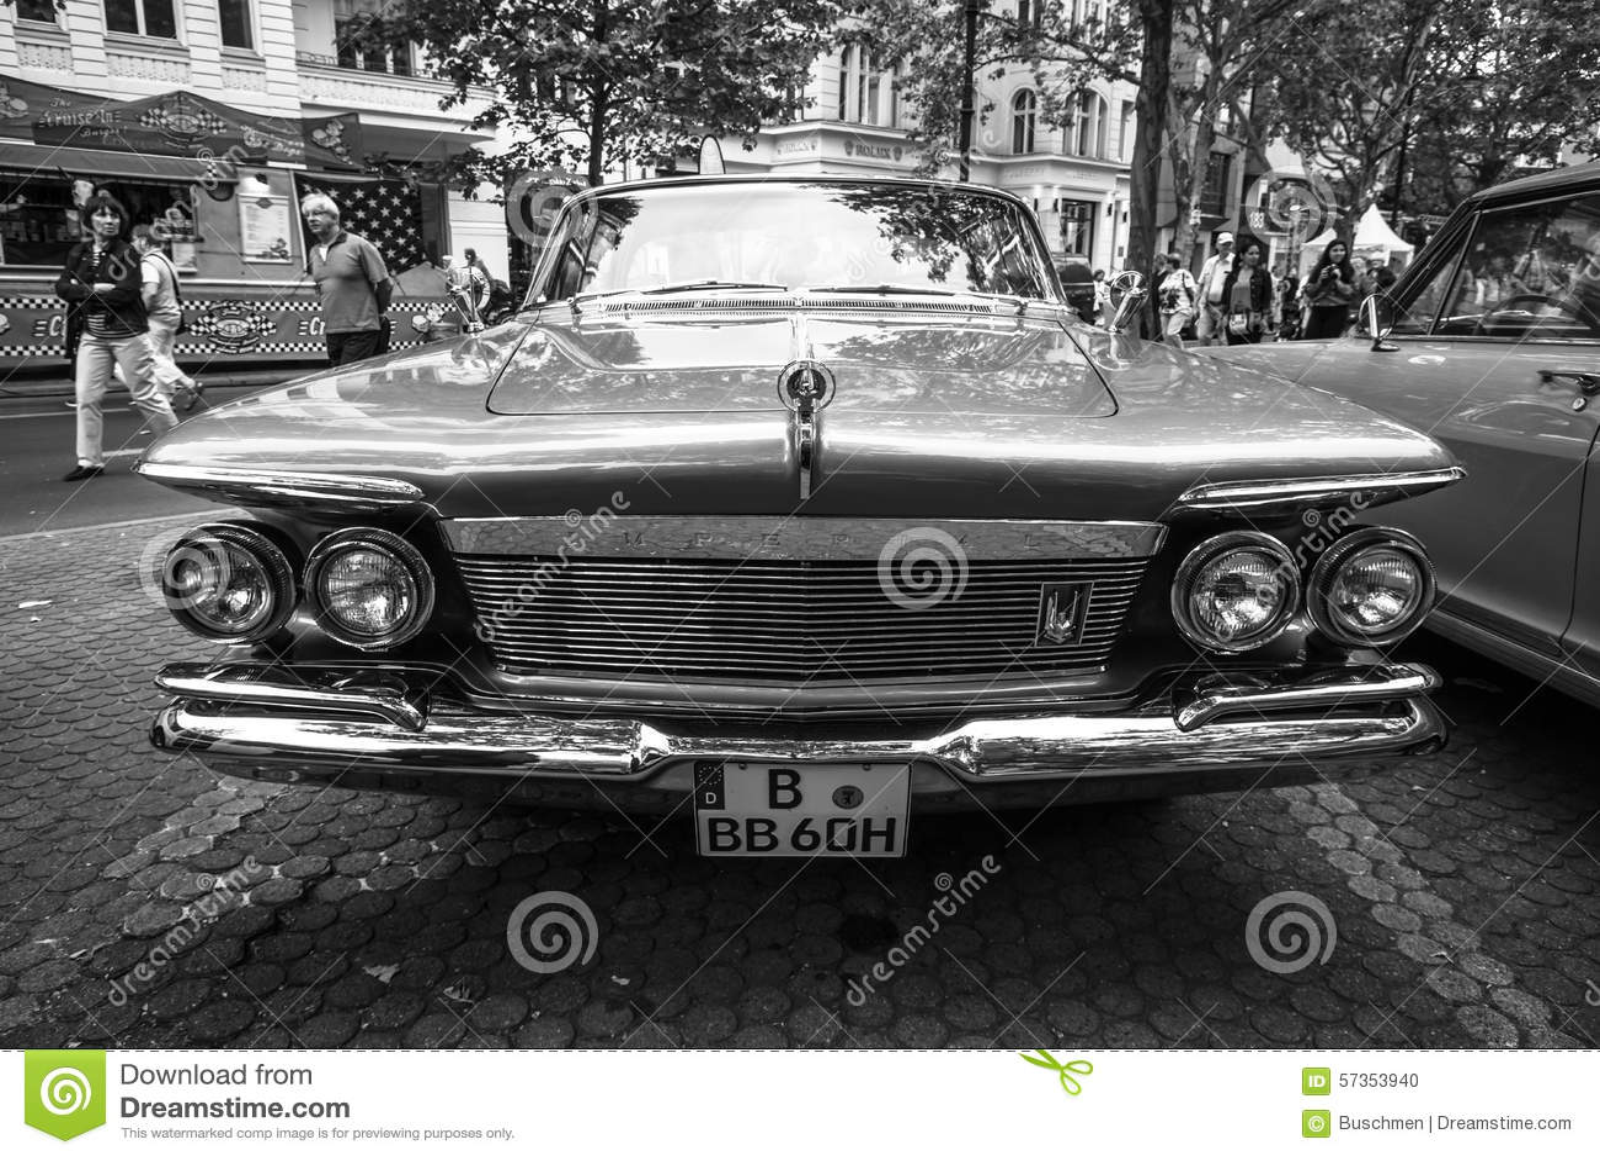 Luxury Car Imperial Custom 4-door Southampton, 1961 Editorial Image